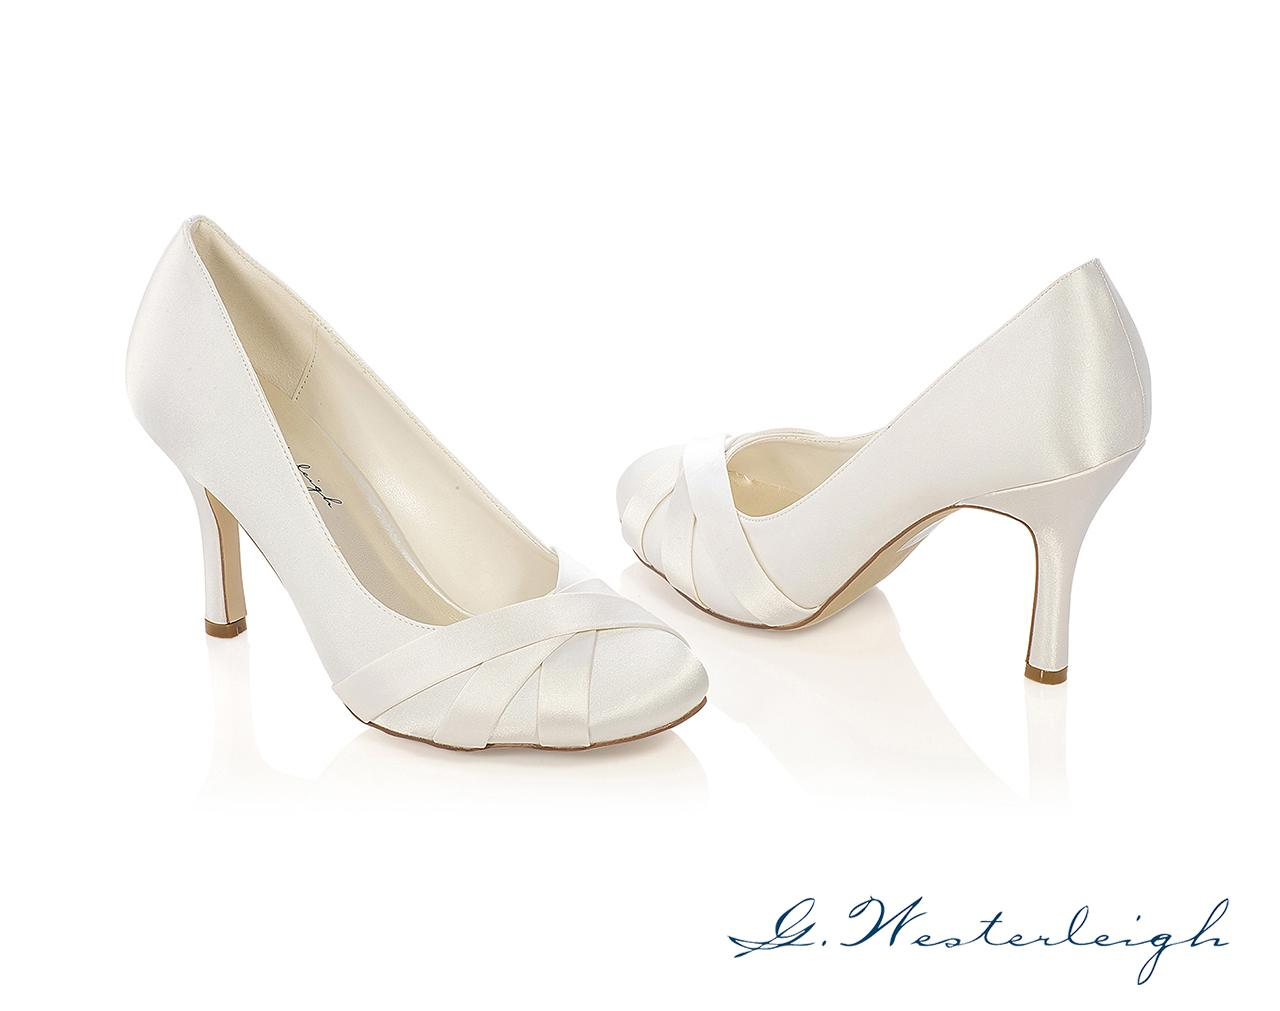 GRETA - Westerleigh cipő. 23.500 Ft. 9 cm sarok